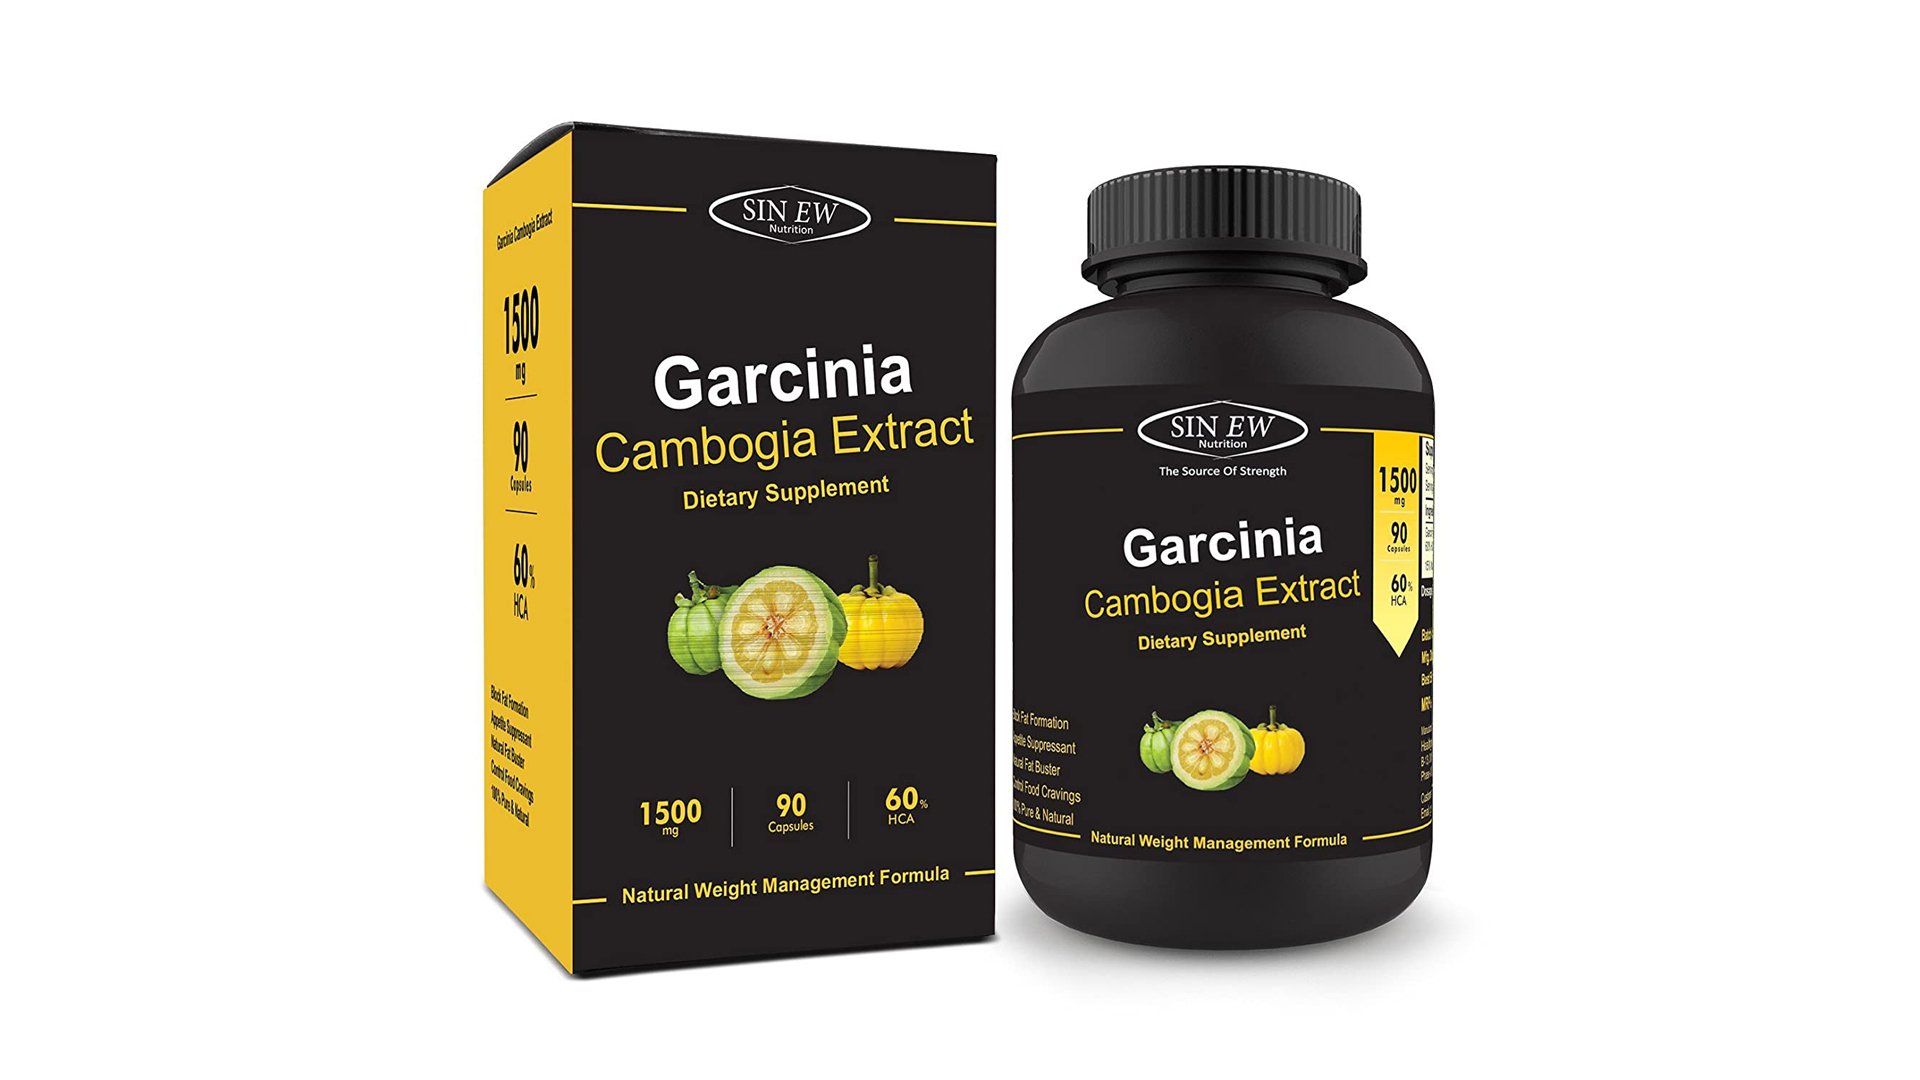 Sinew Nutrition Garcinia Cambogia Extract